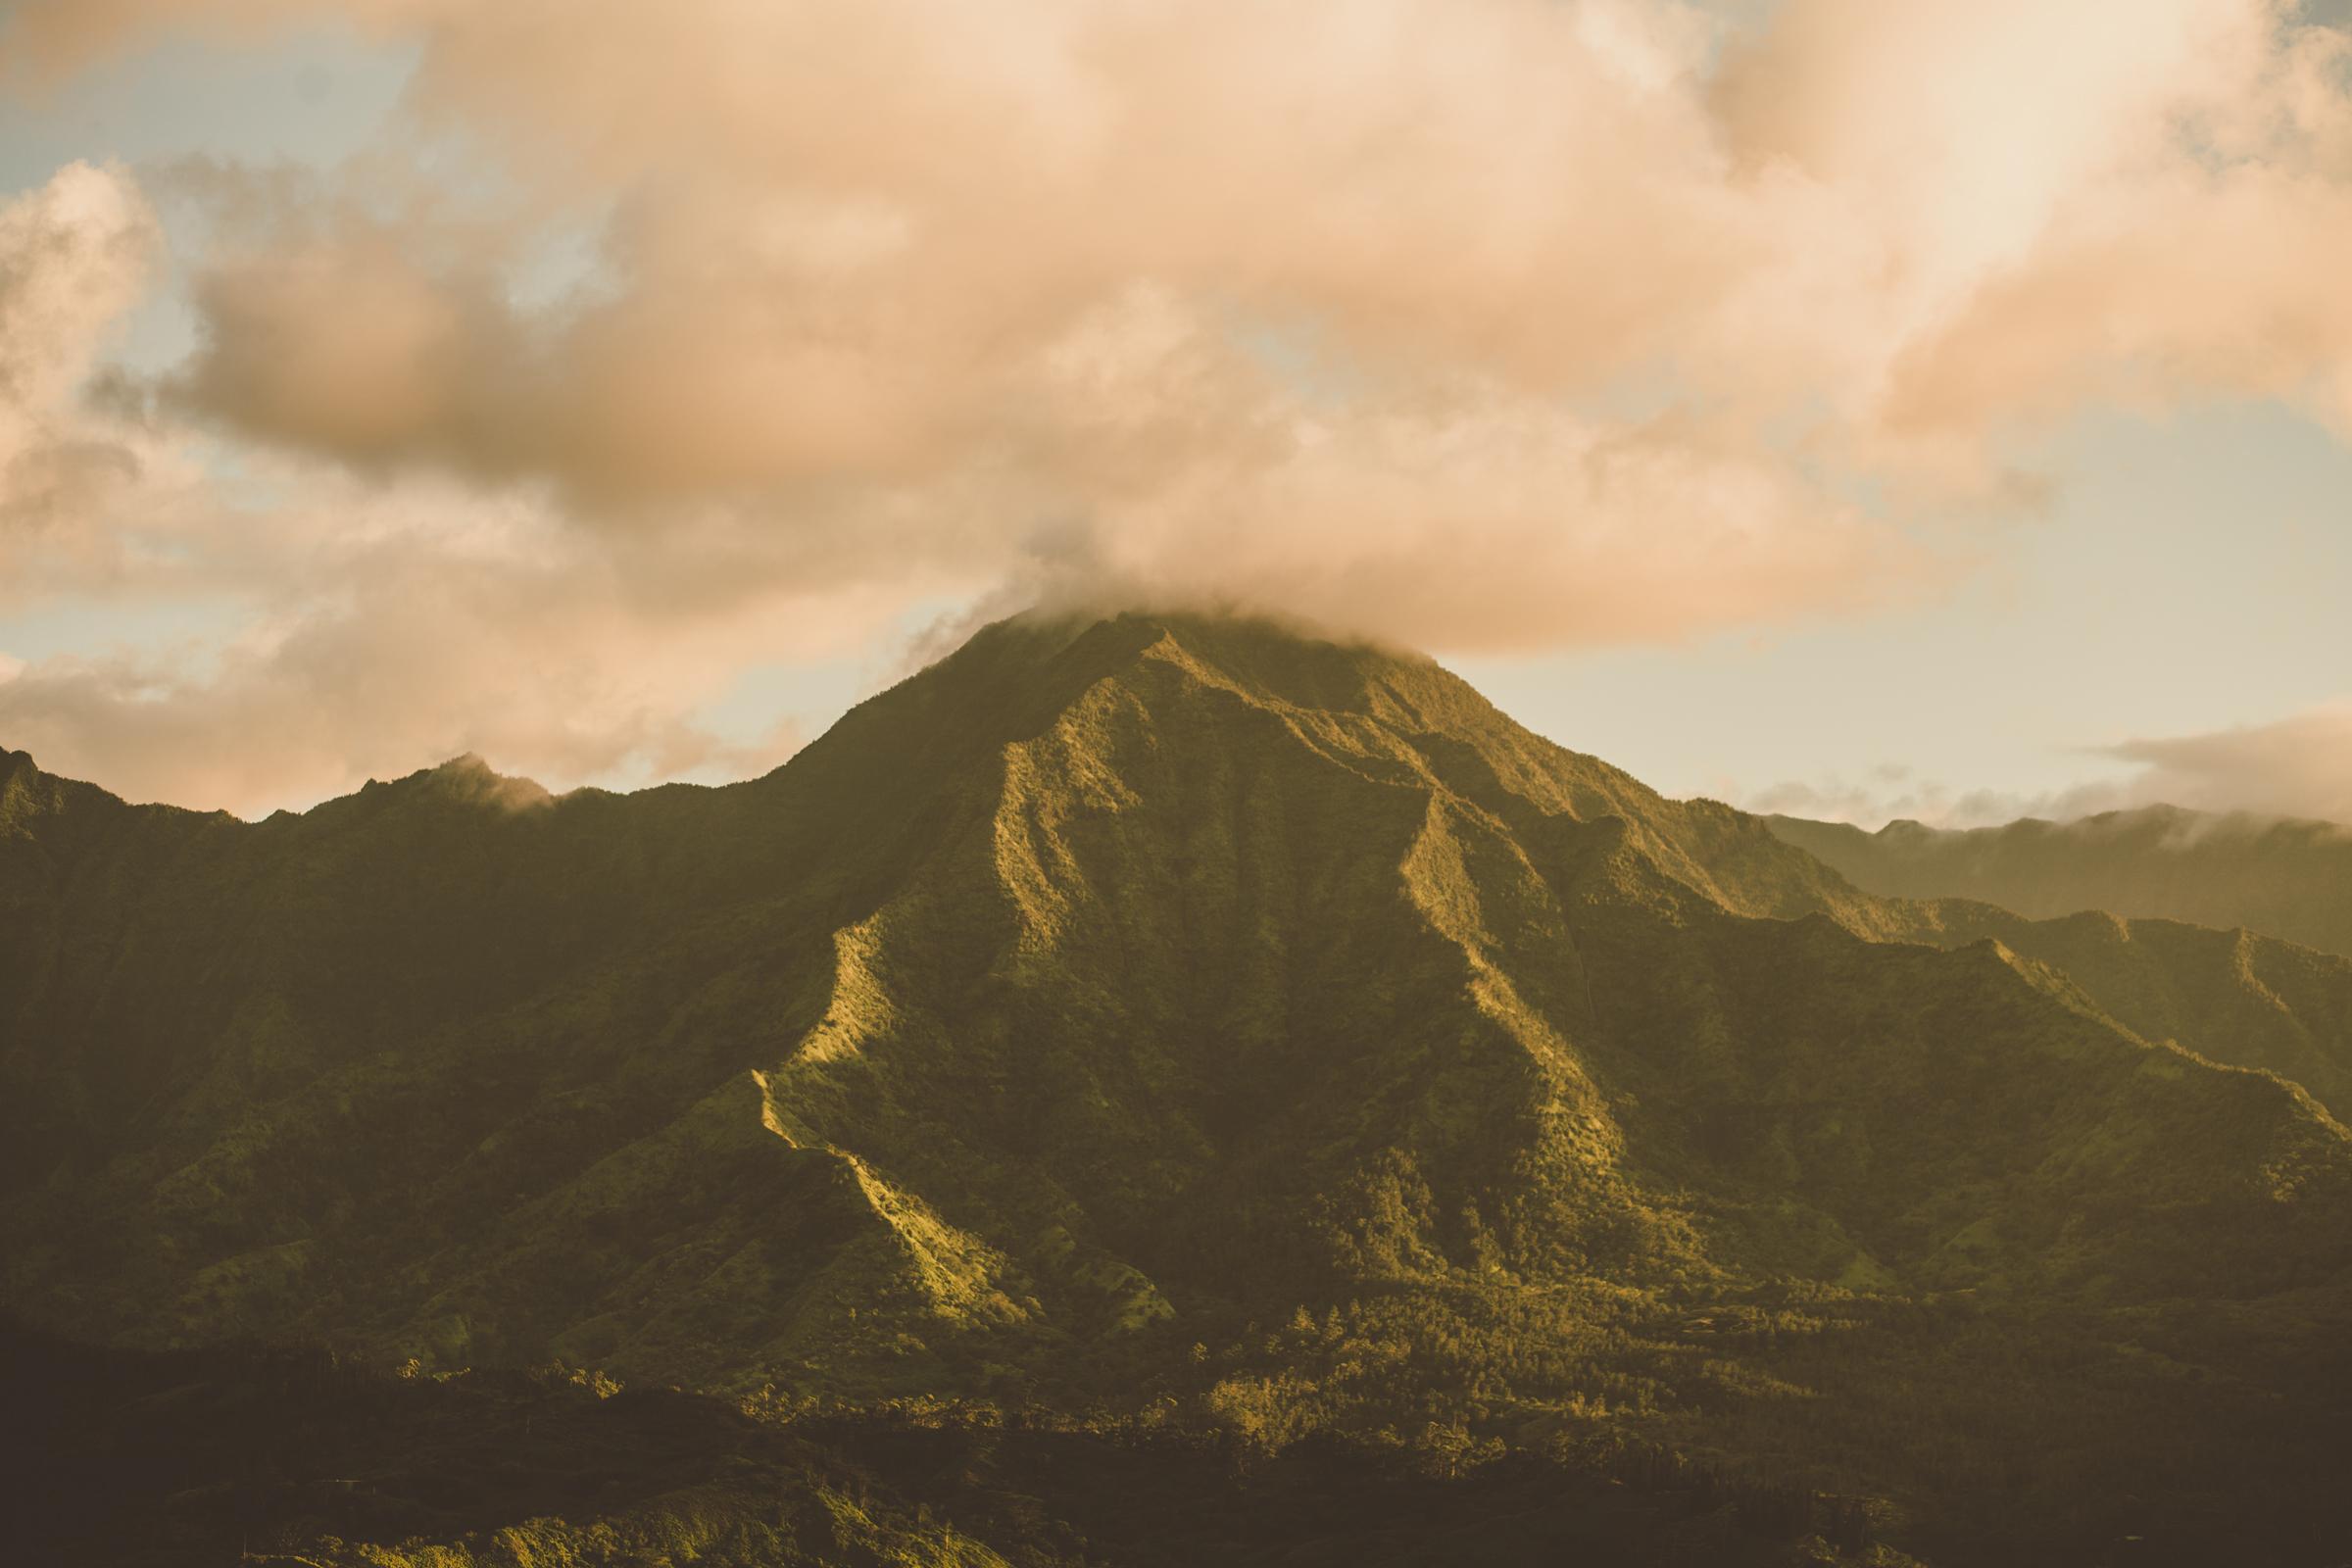 IMG_2763-KAUAI-HAWAII-JENNIFER-PICARD-PHOTOGRAPHY.jpg